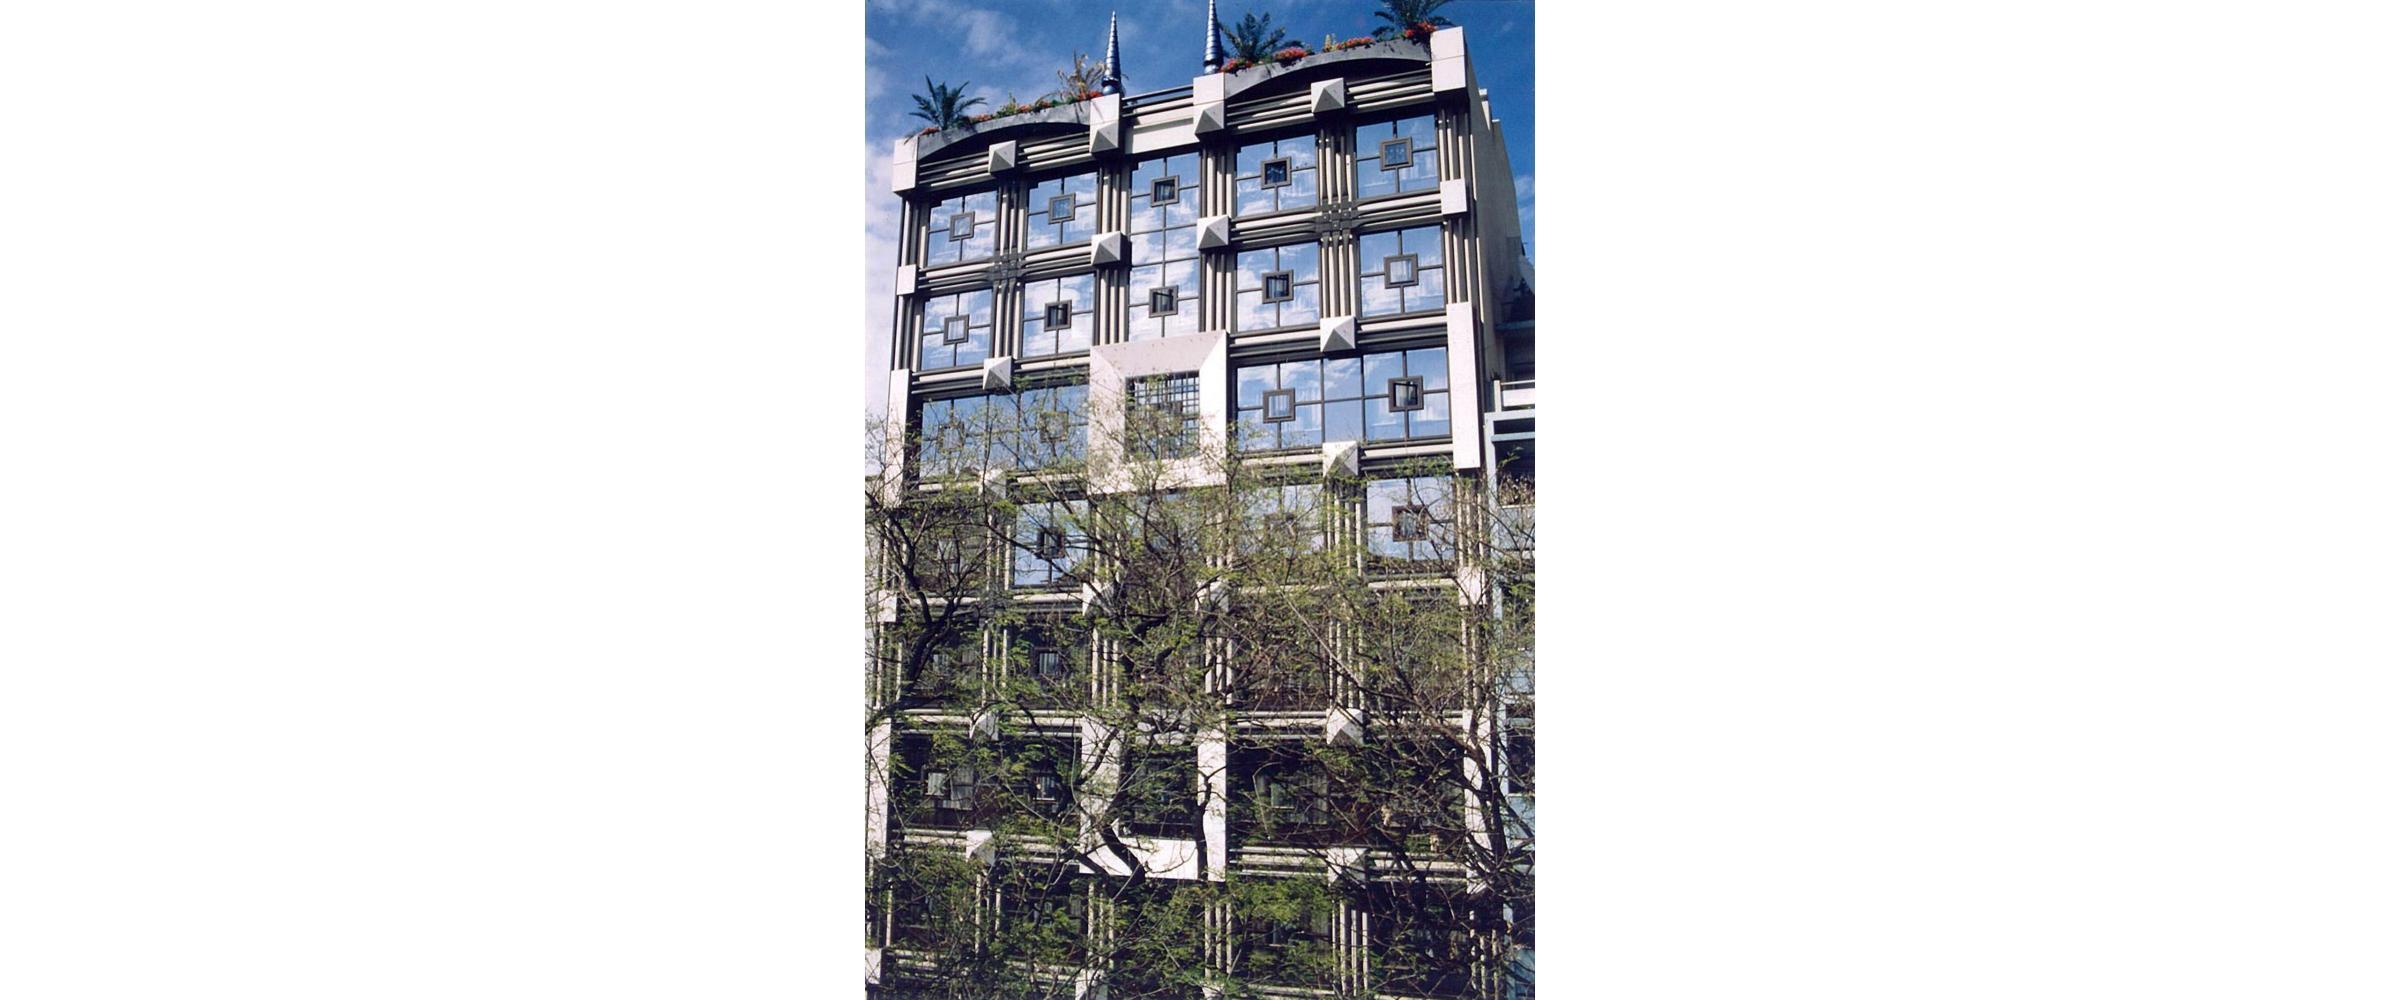 Hôtel Carlton - Lisbonne - Portugal